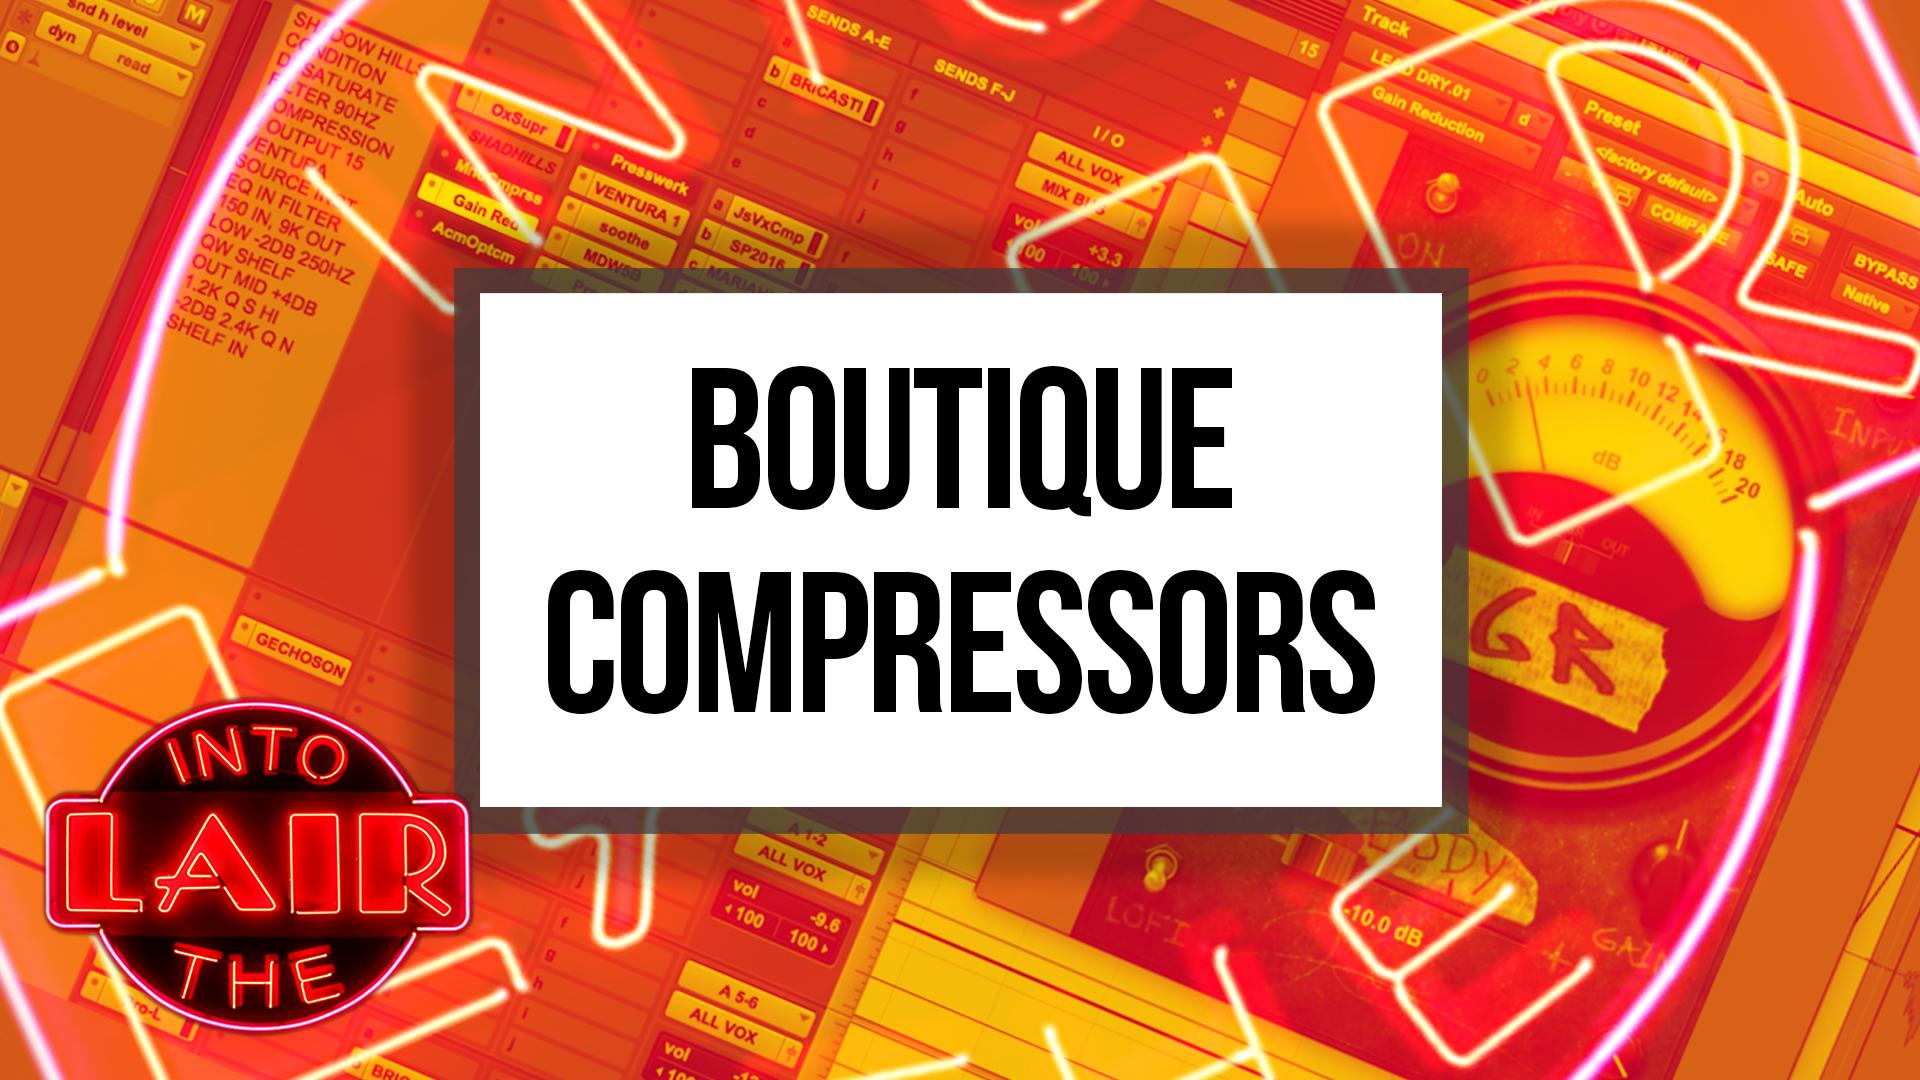 Boutique Compressors